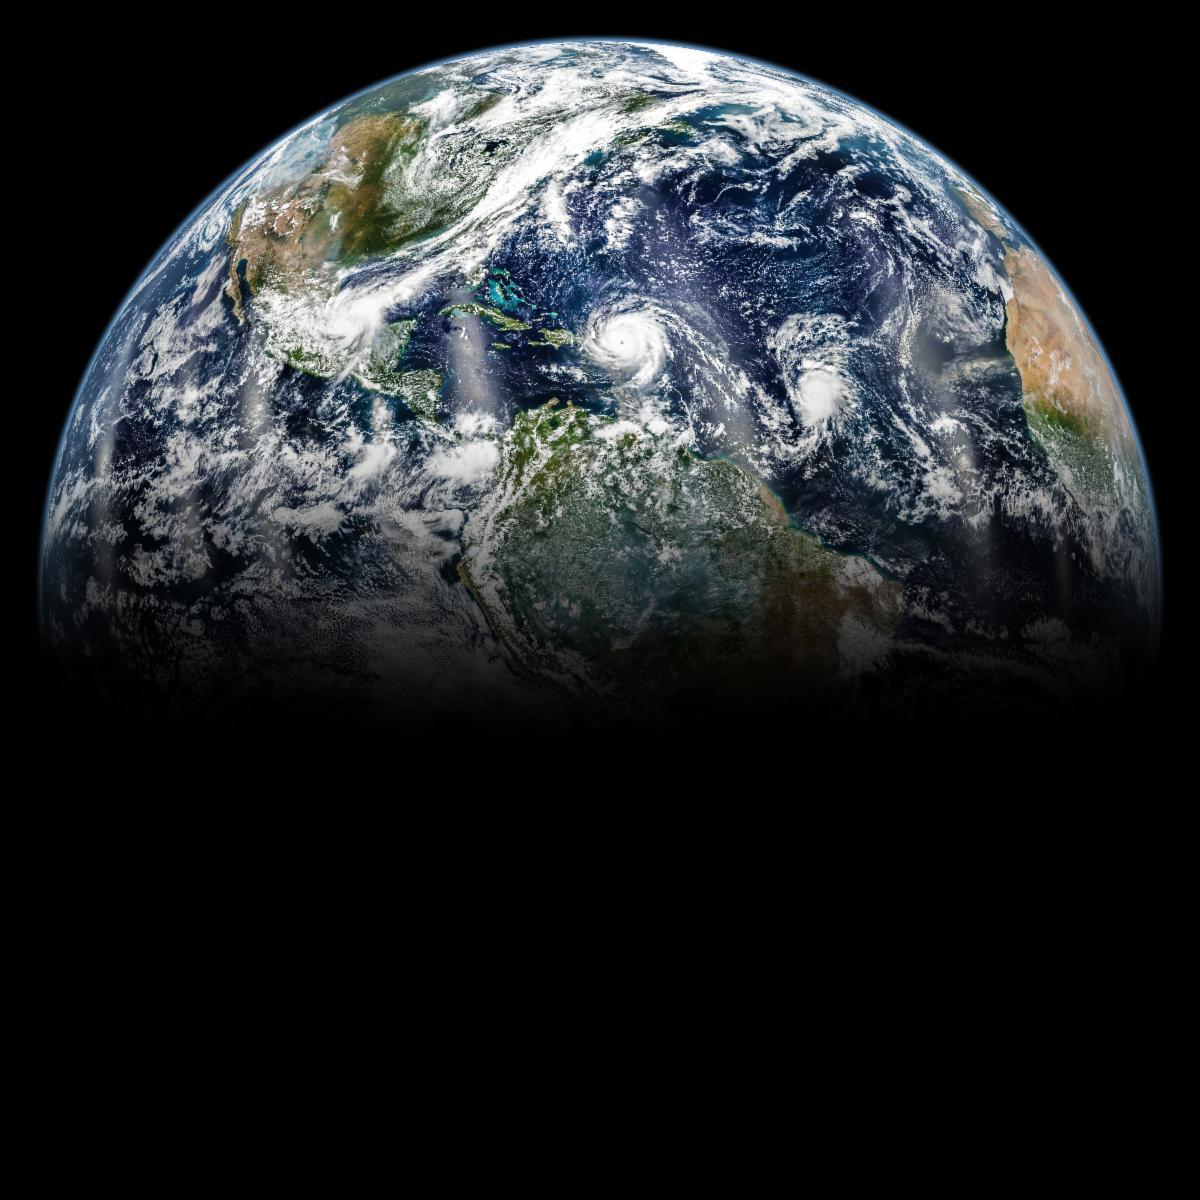 September 6 2017 NASA Earth Observatory image by Joshua Stevens using VIIRS data from LANCE-EOSDIS Rapid Response